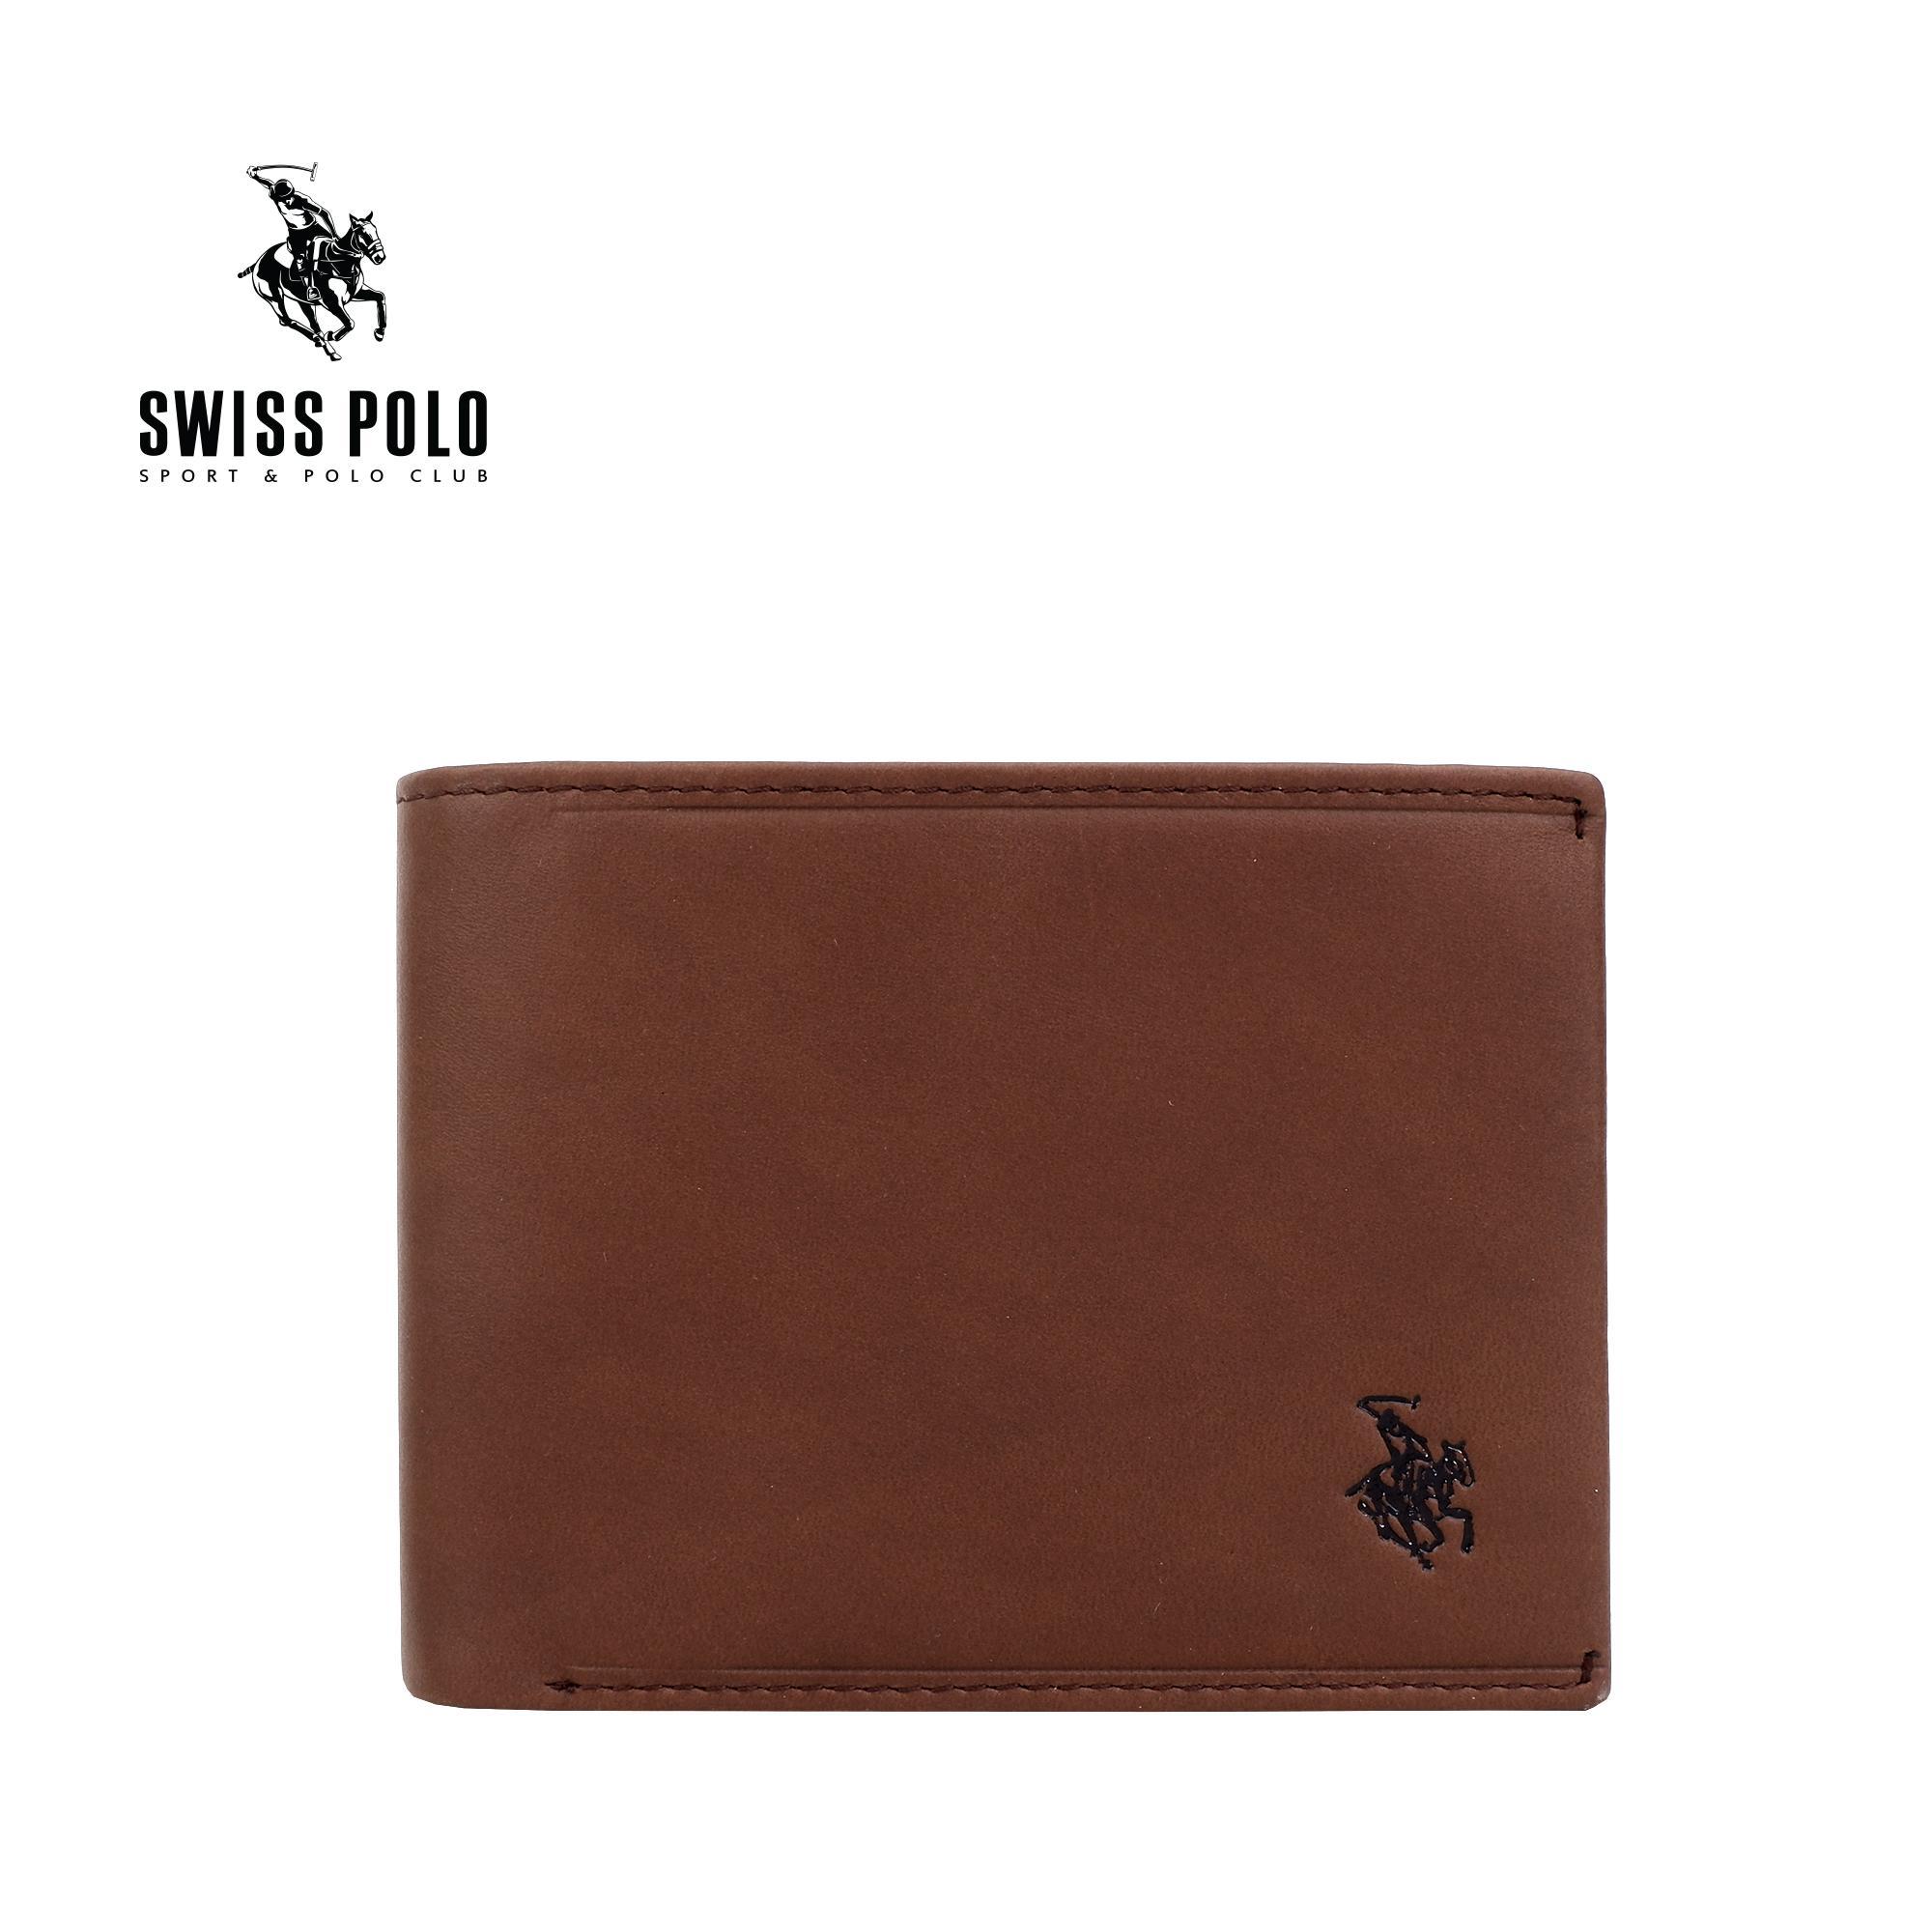 SWISS POLO G.L WALLET SW 136-2 BROWN